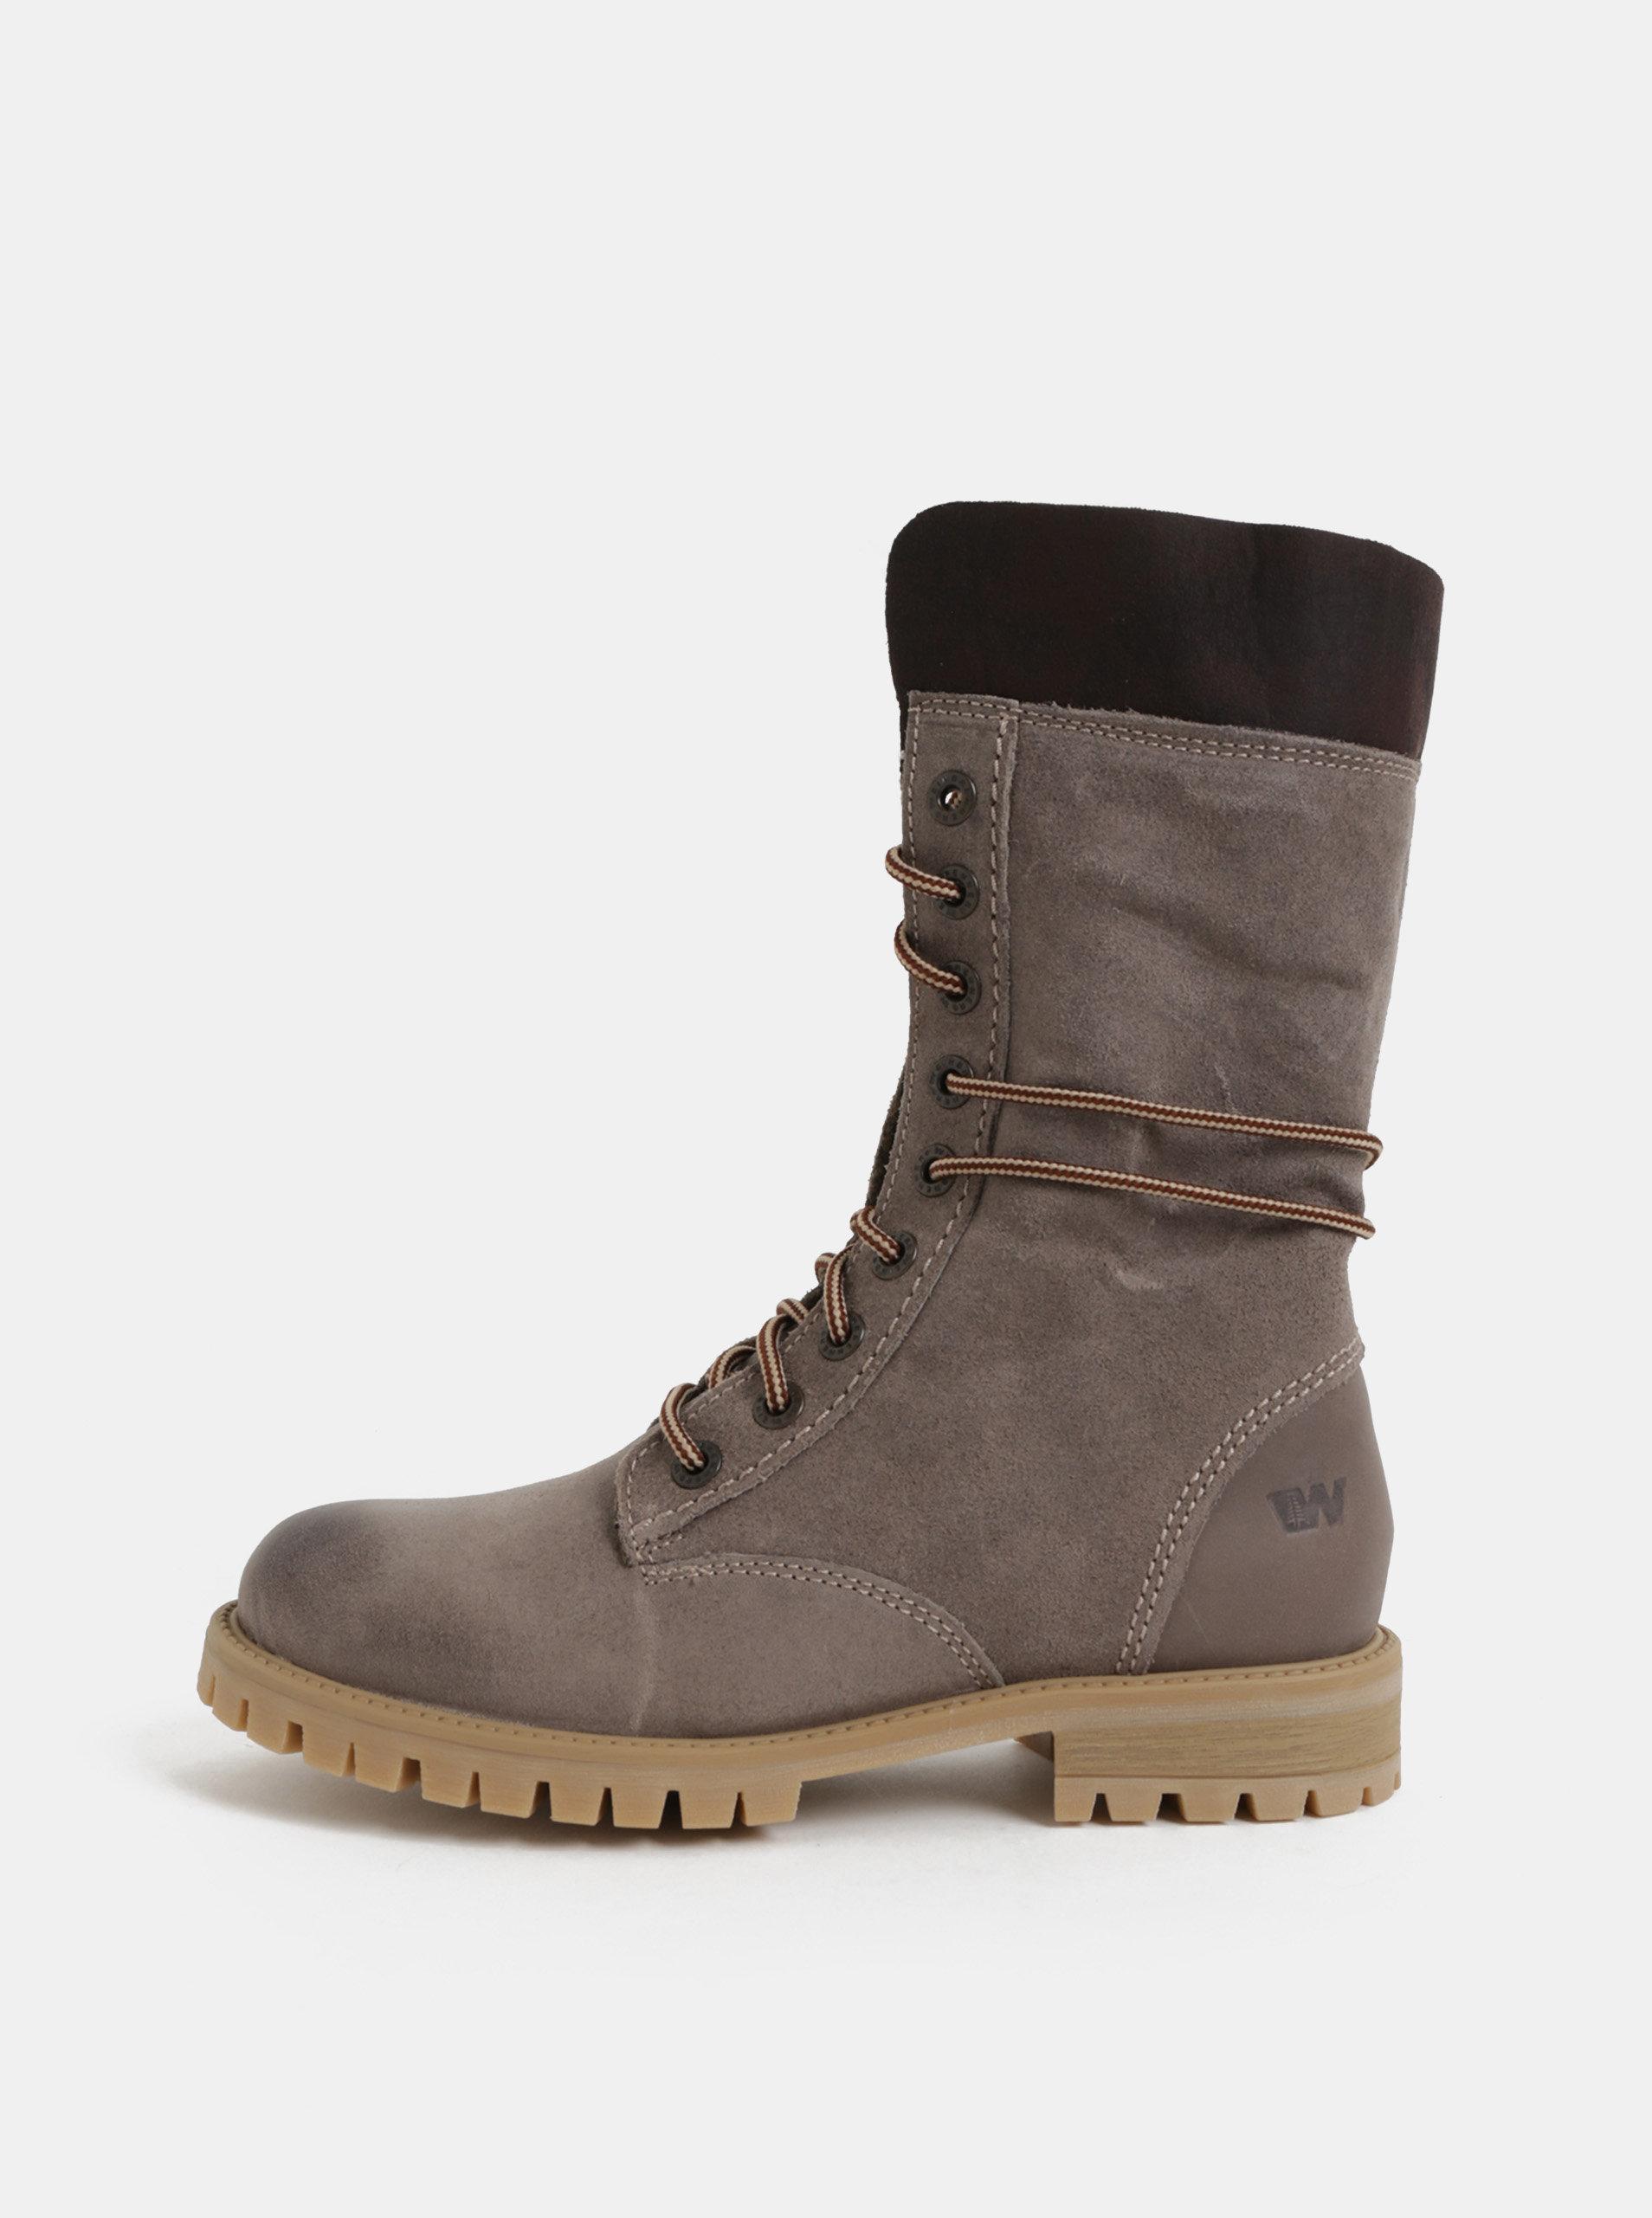 6161c92d1daf Sivé dámske semišové členkové zimné topánky so šnurovaním Weinbrenner ...